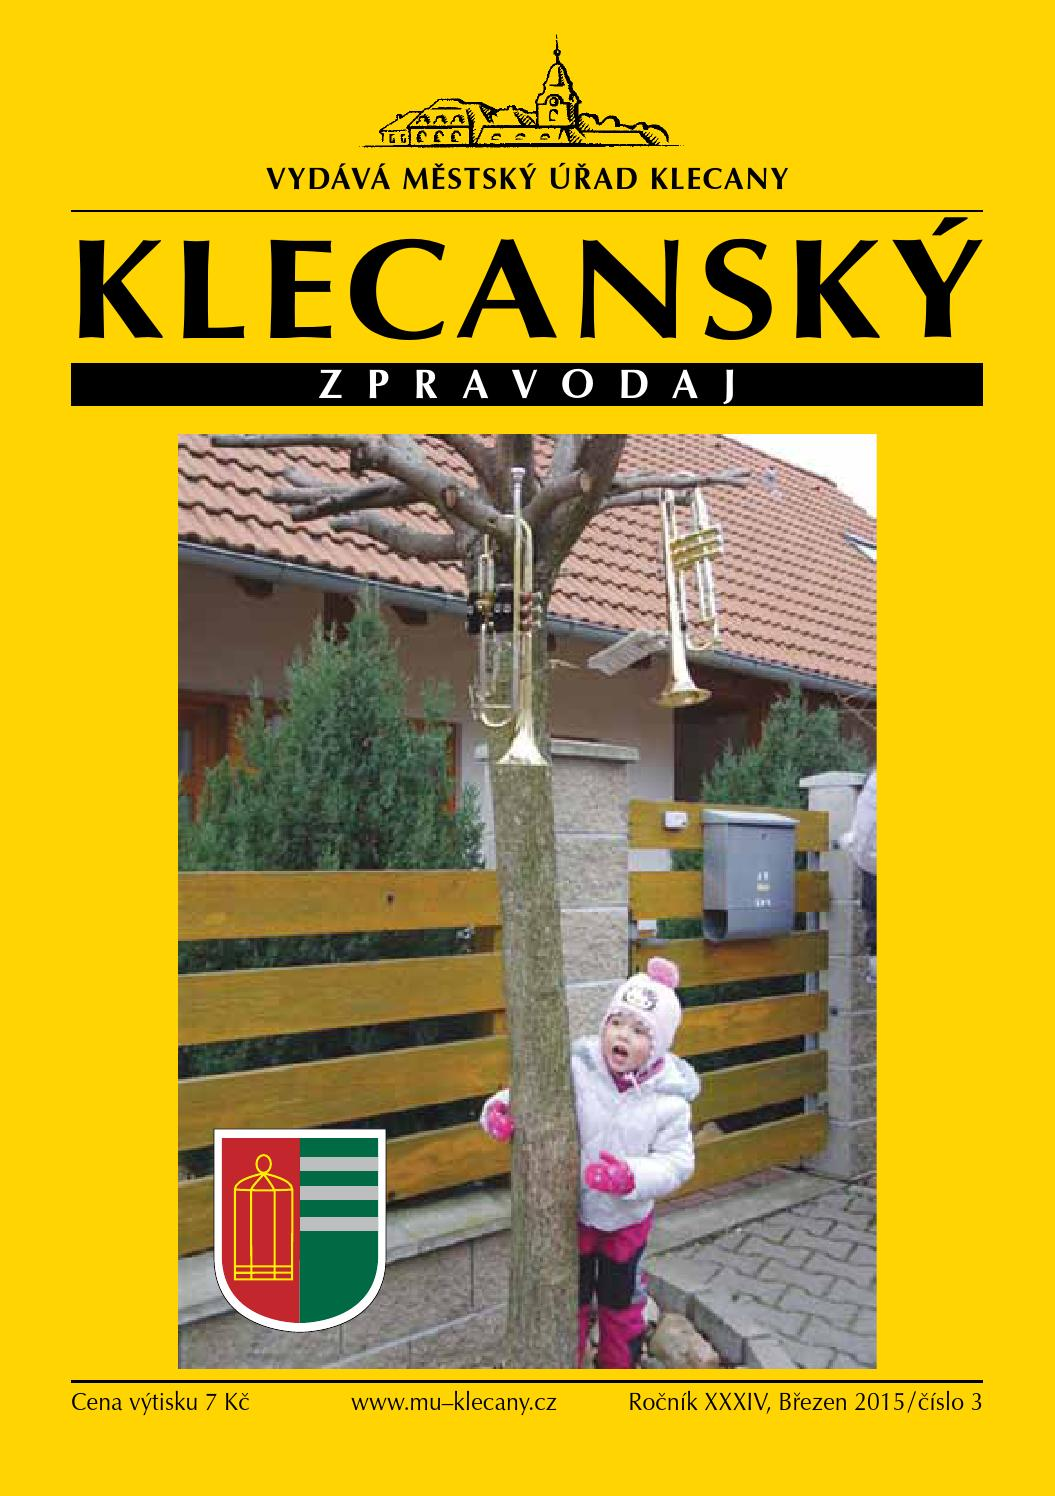 KLECANSK - Msto Klecany